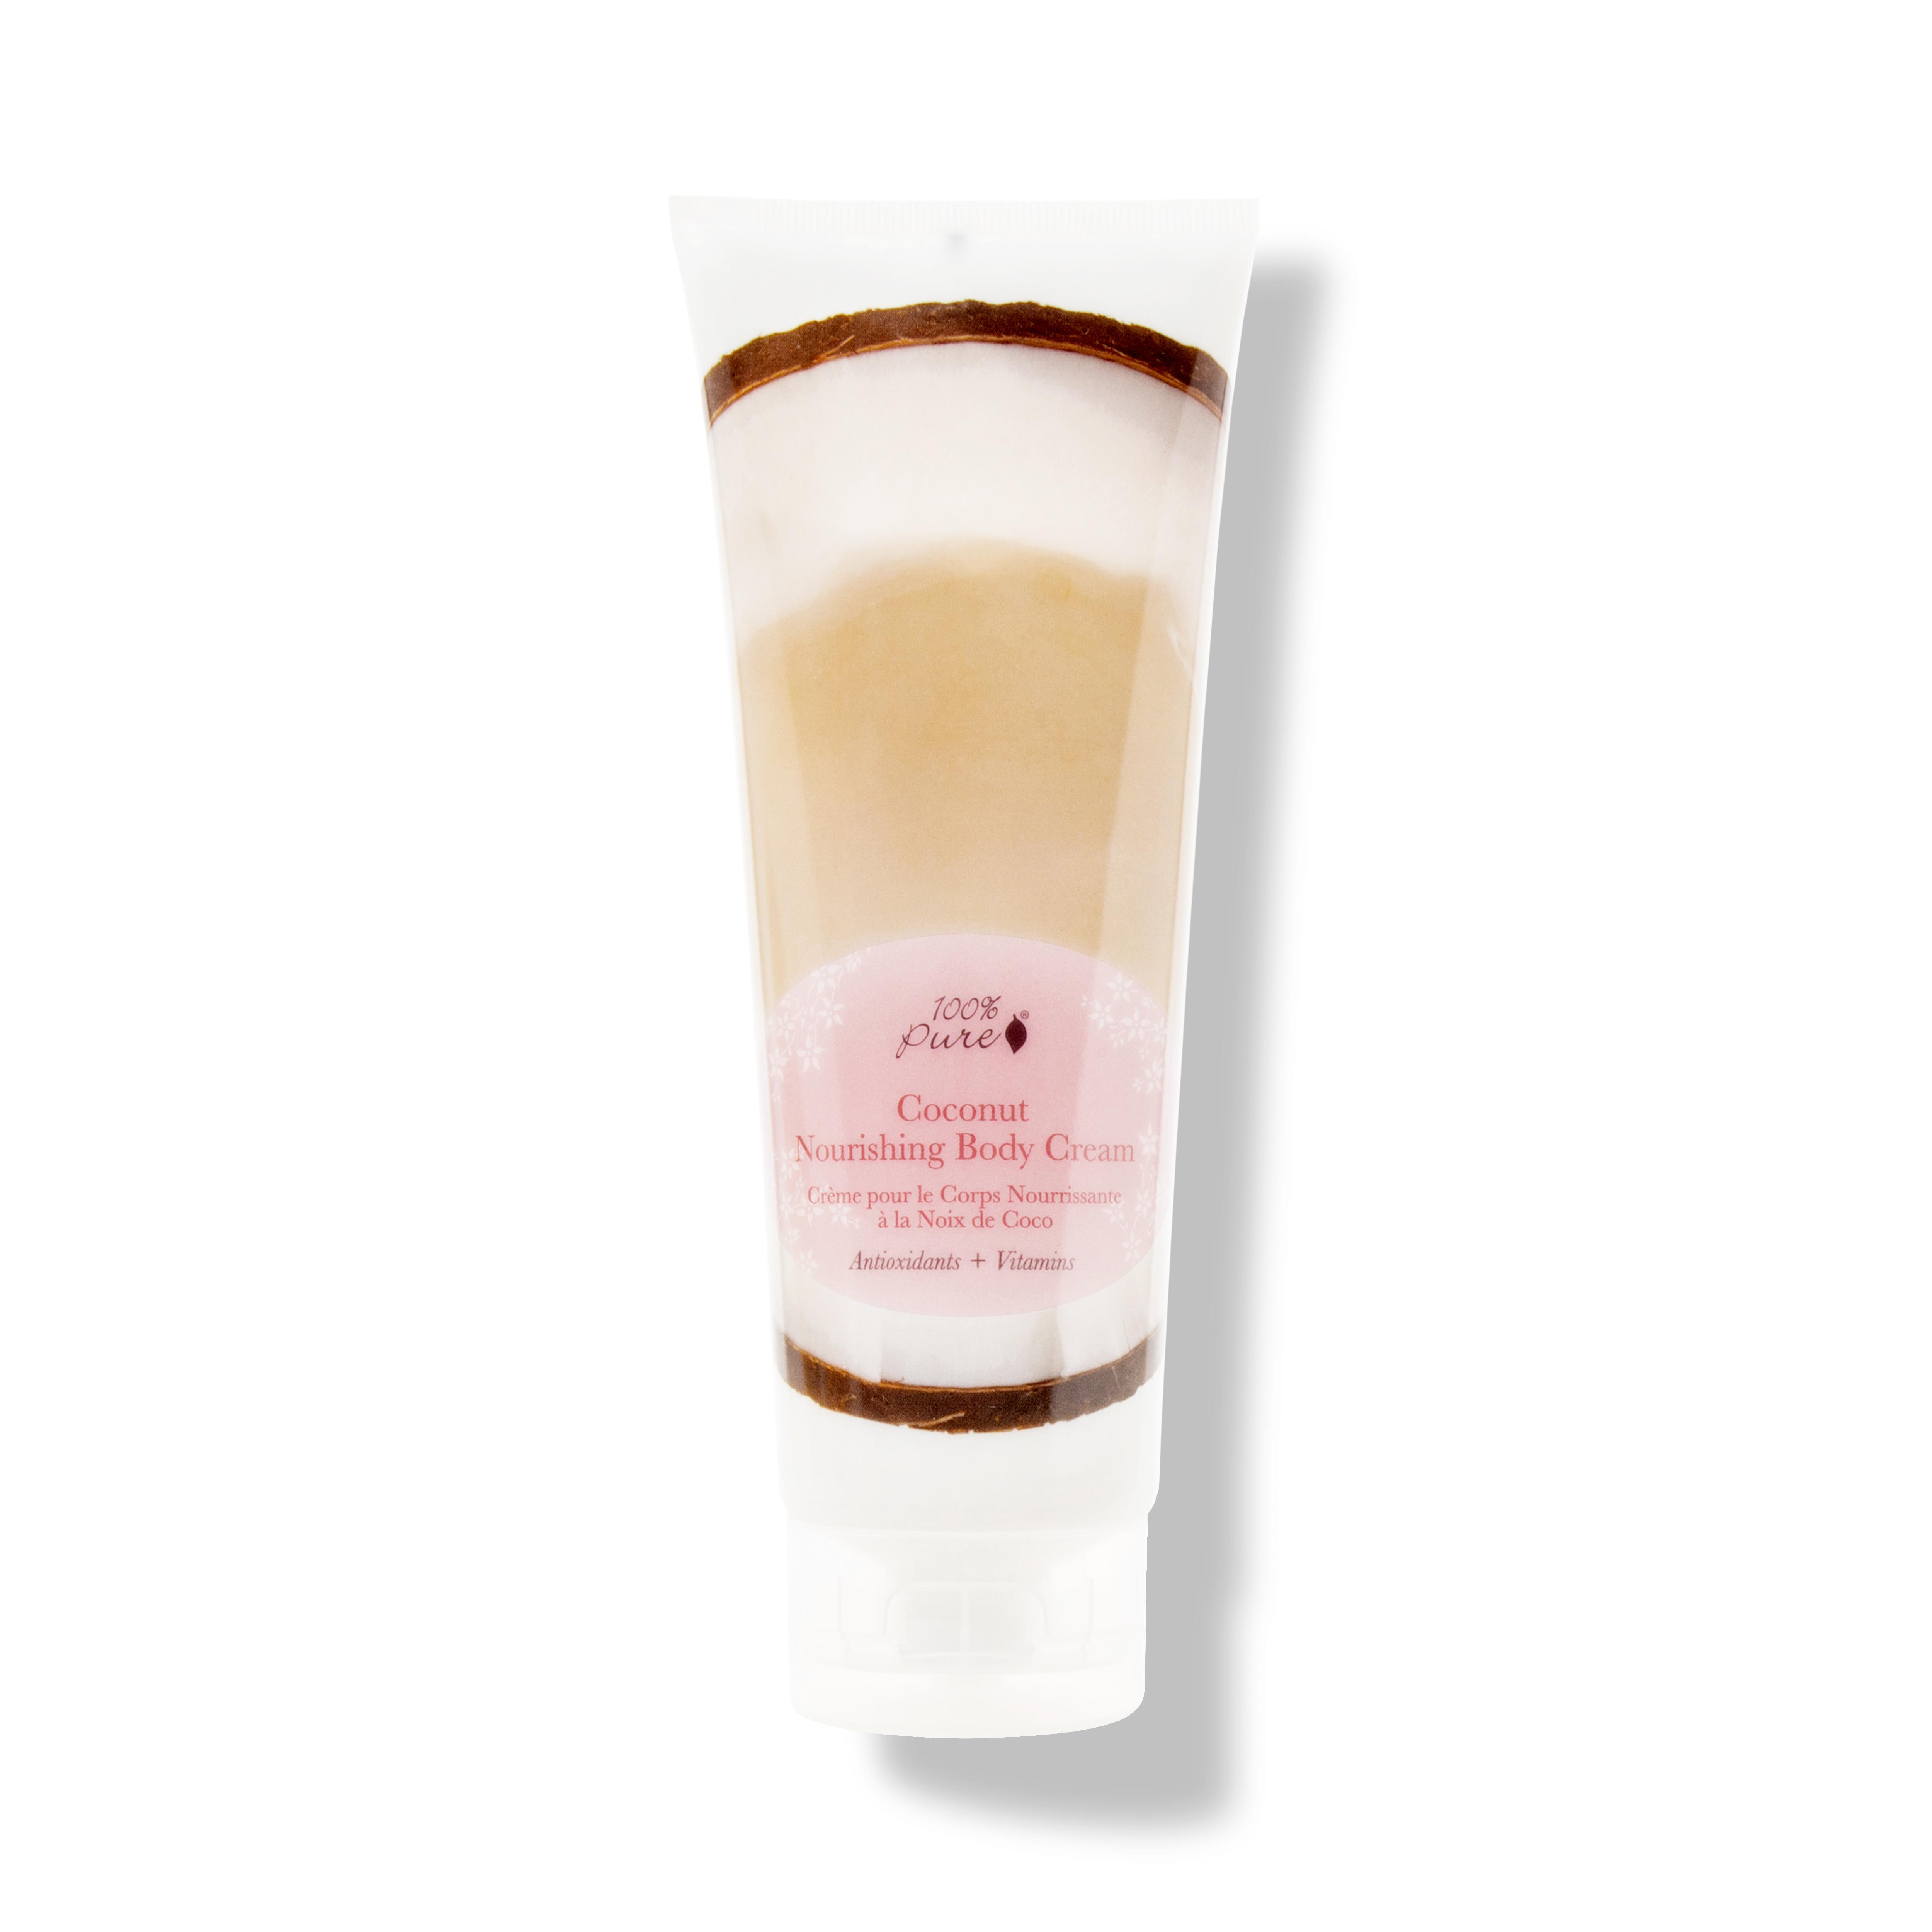 Product Grid - Coconut Nourishing Body Cream